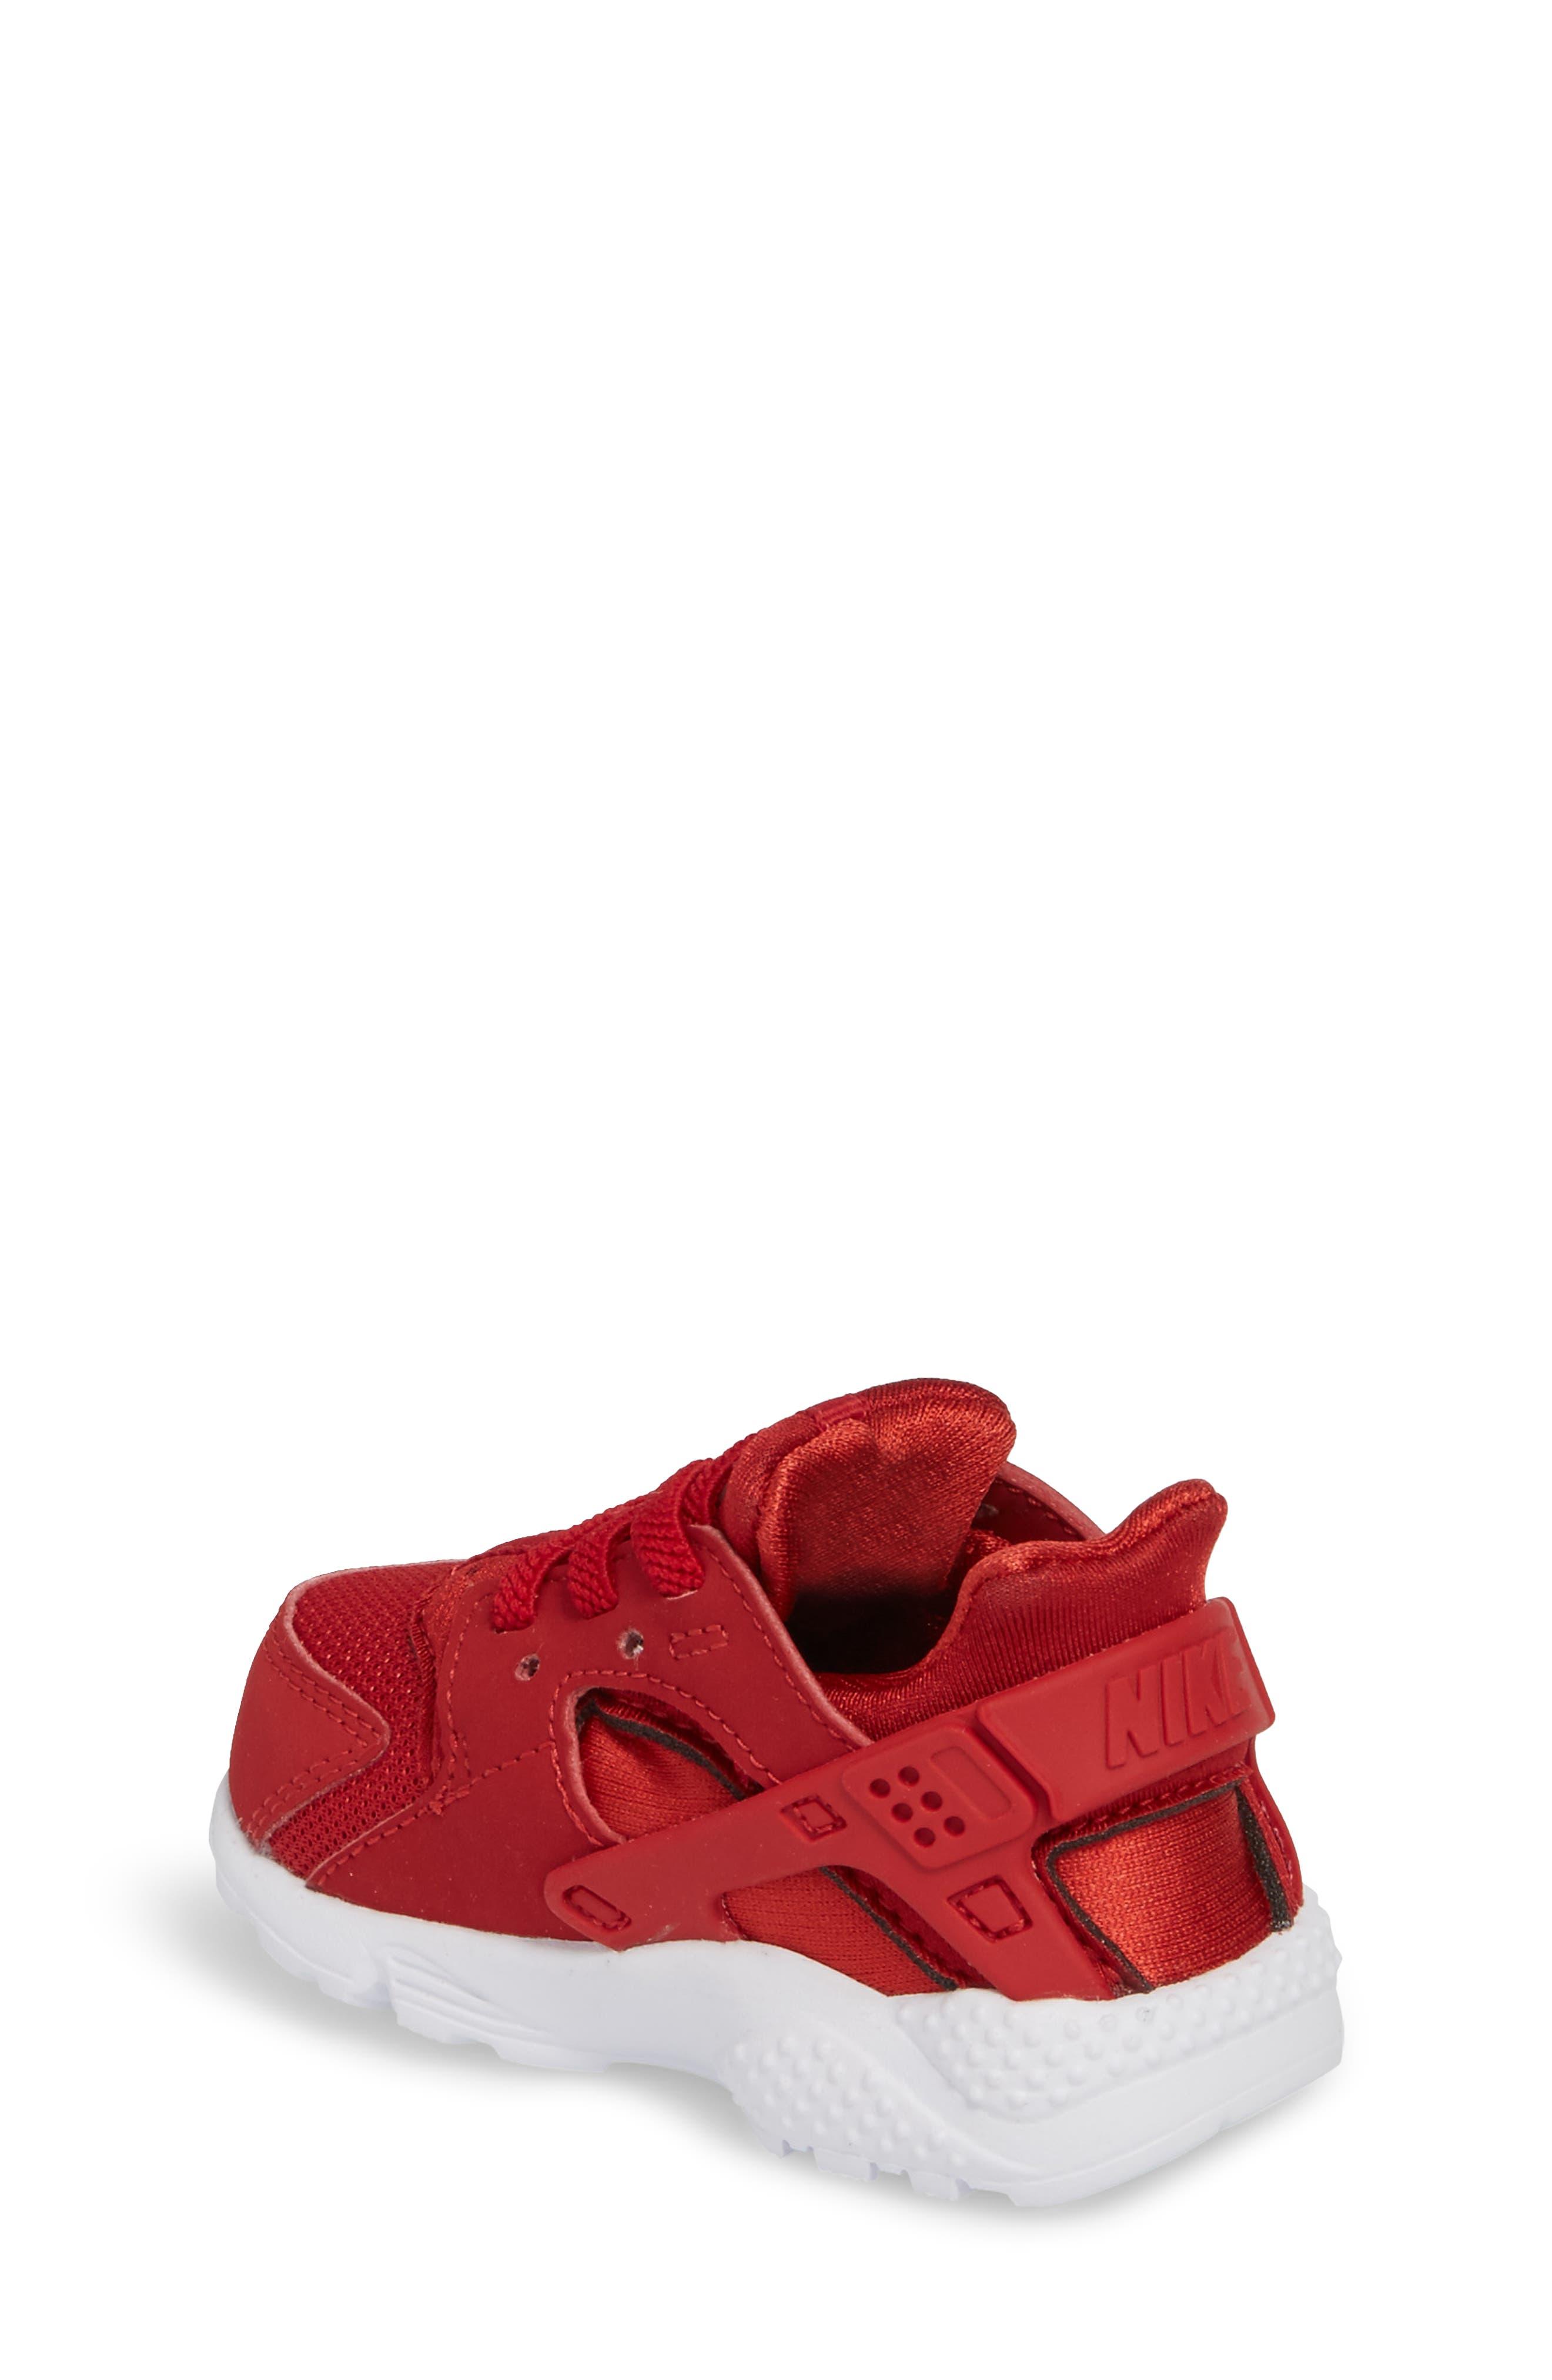 'Huarache Run' Sneaker,                             Alternate thumbnail 2, color,                             Gym Red/ Dark Grey/ White